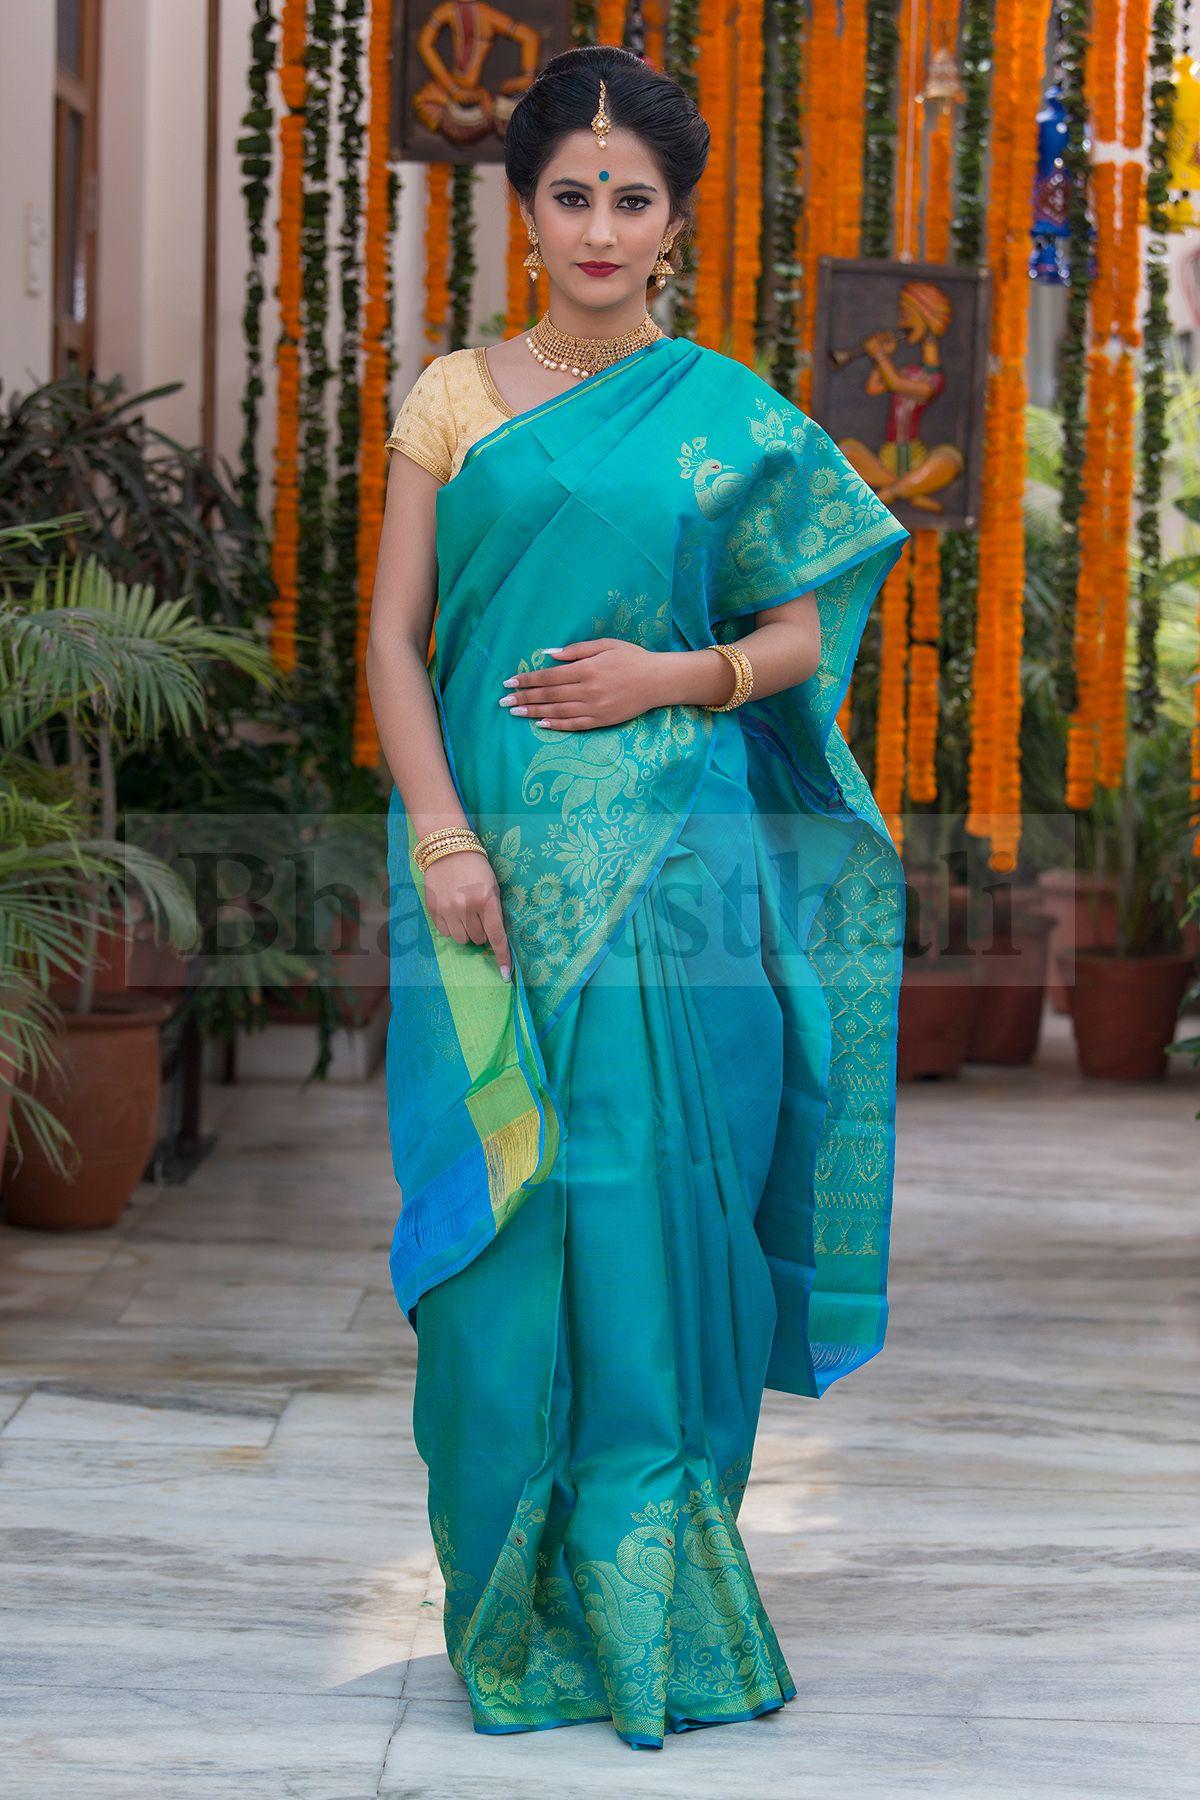 Teal Blue Pure Kanchipuram Soft Silk Saree